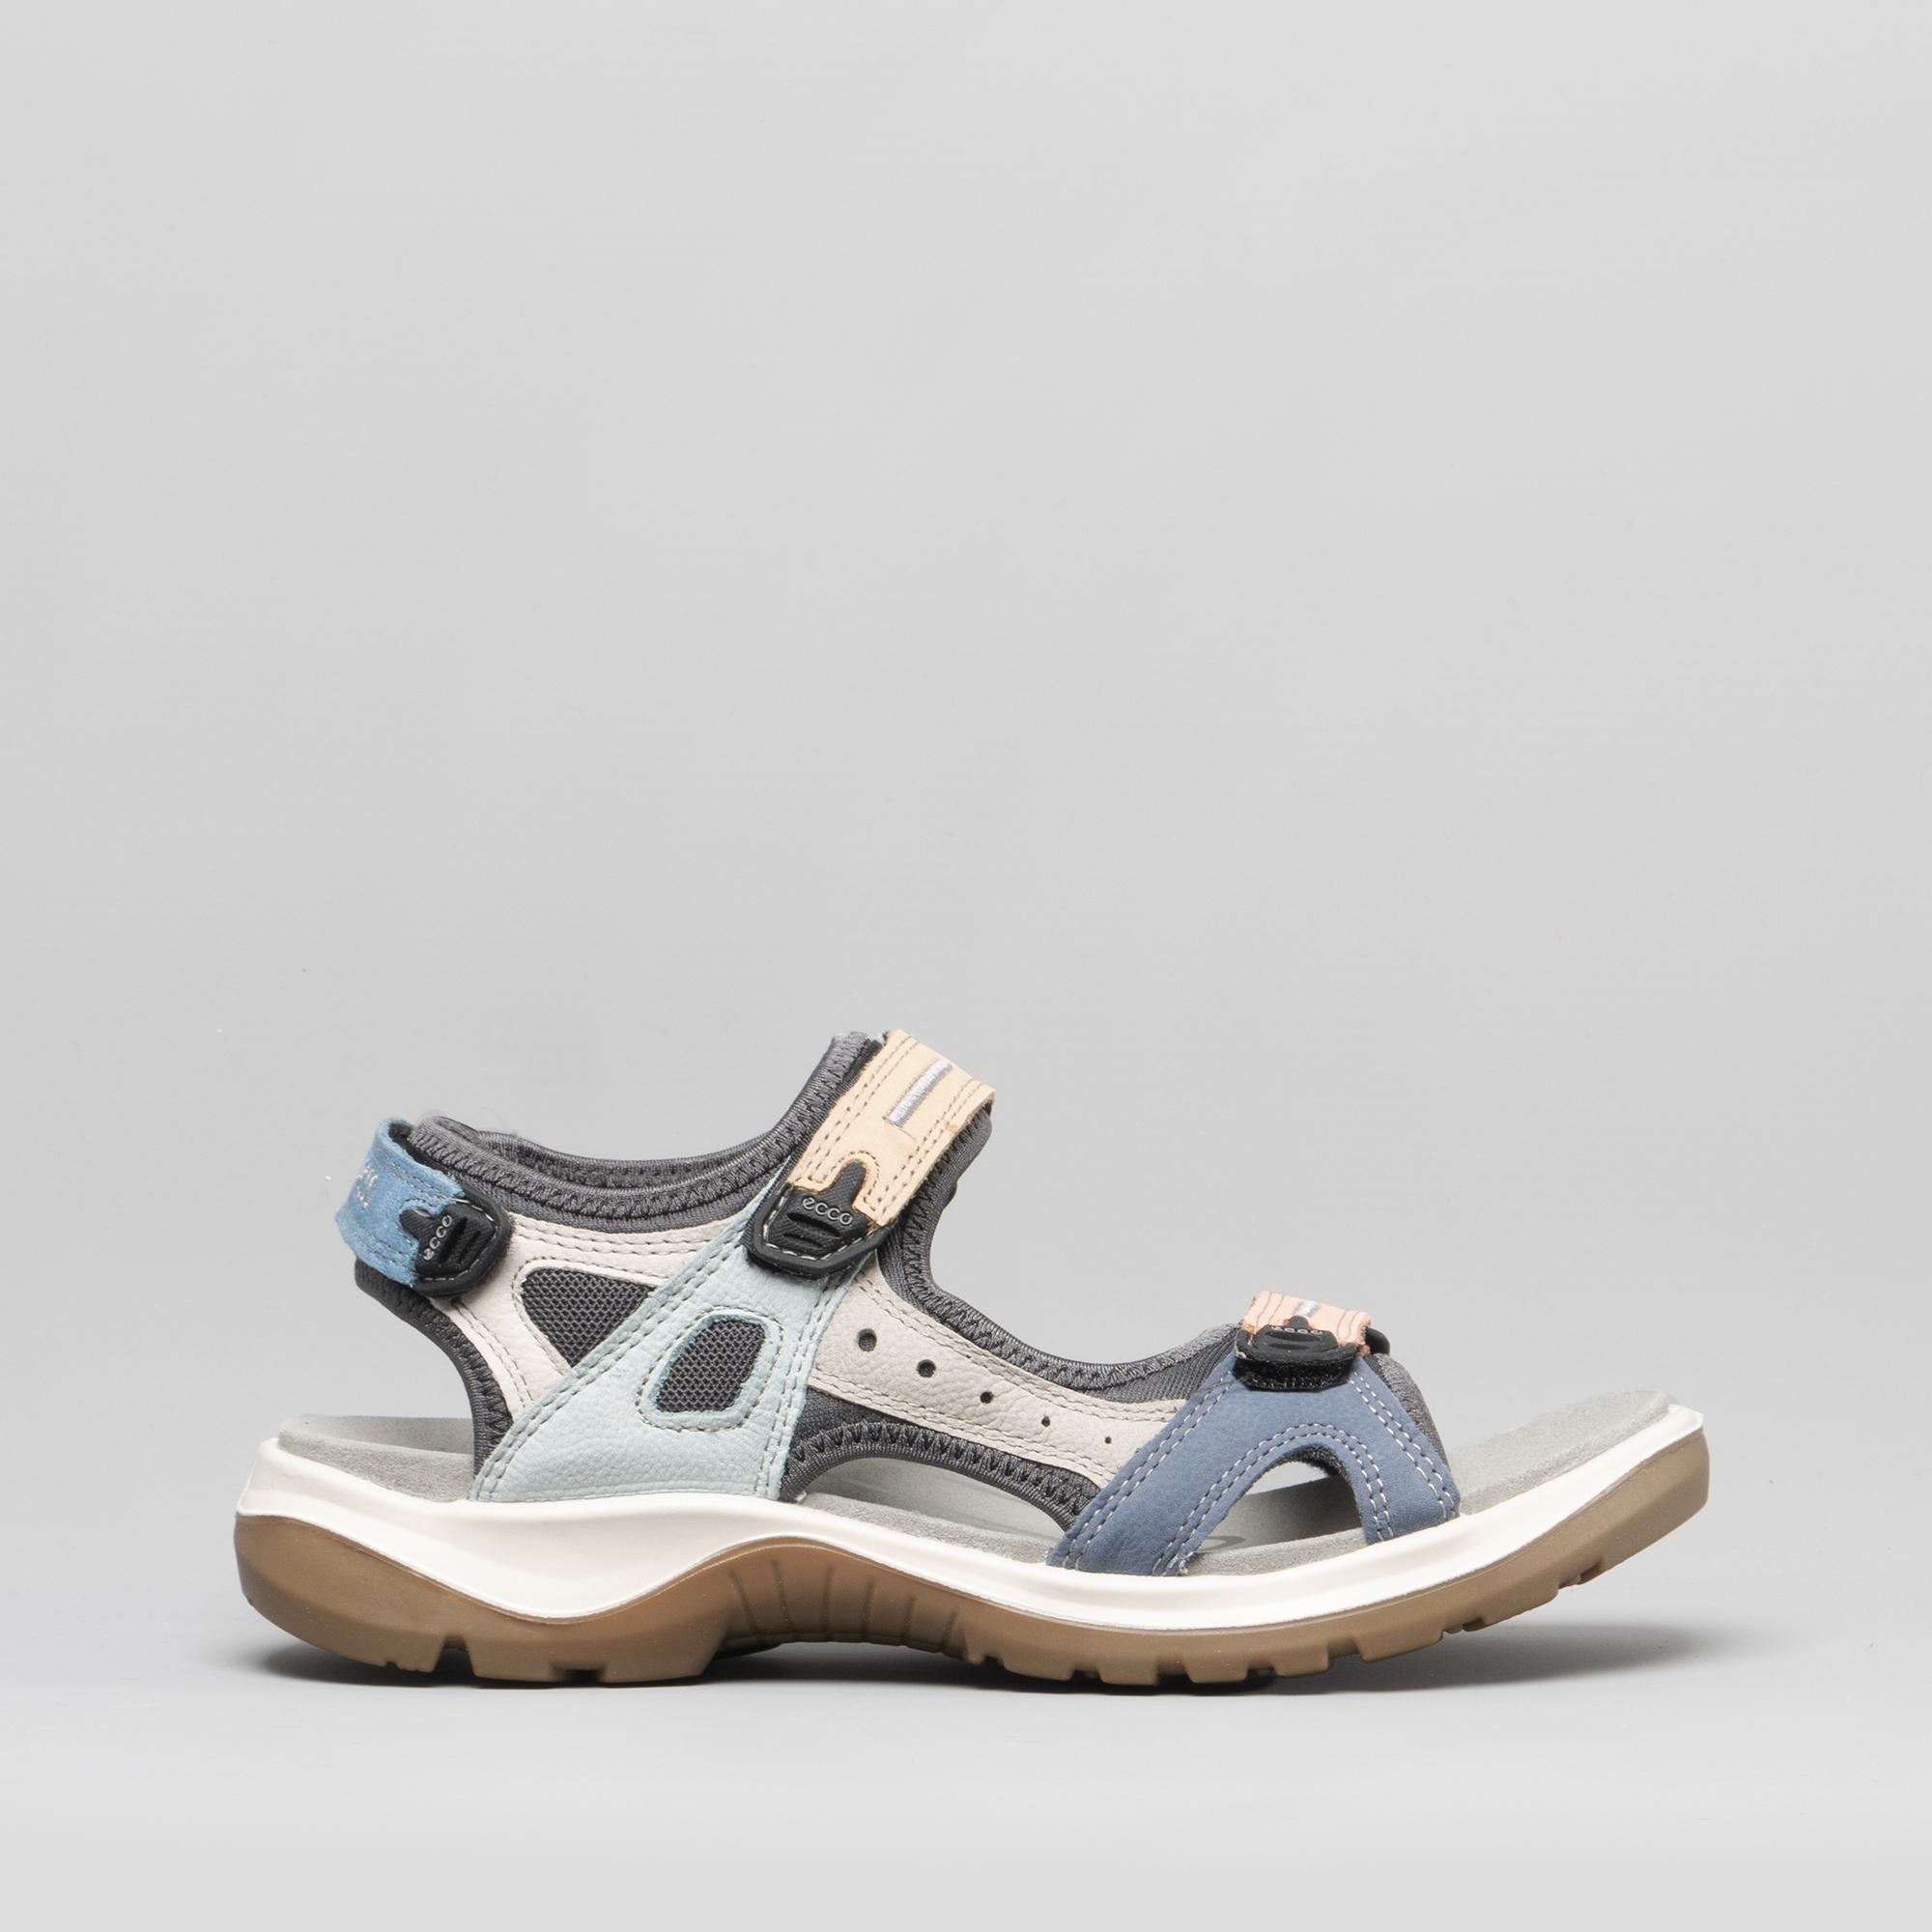 Open Toe Sandals Women's 6 UK  EU Multicolor 55749 ECCO Offroad